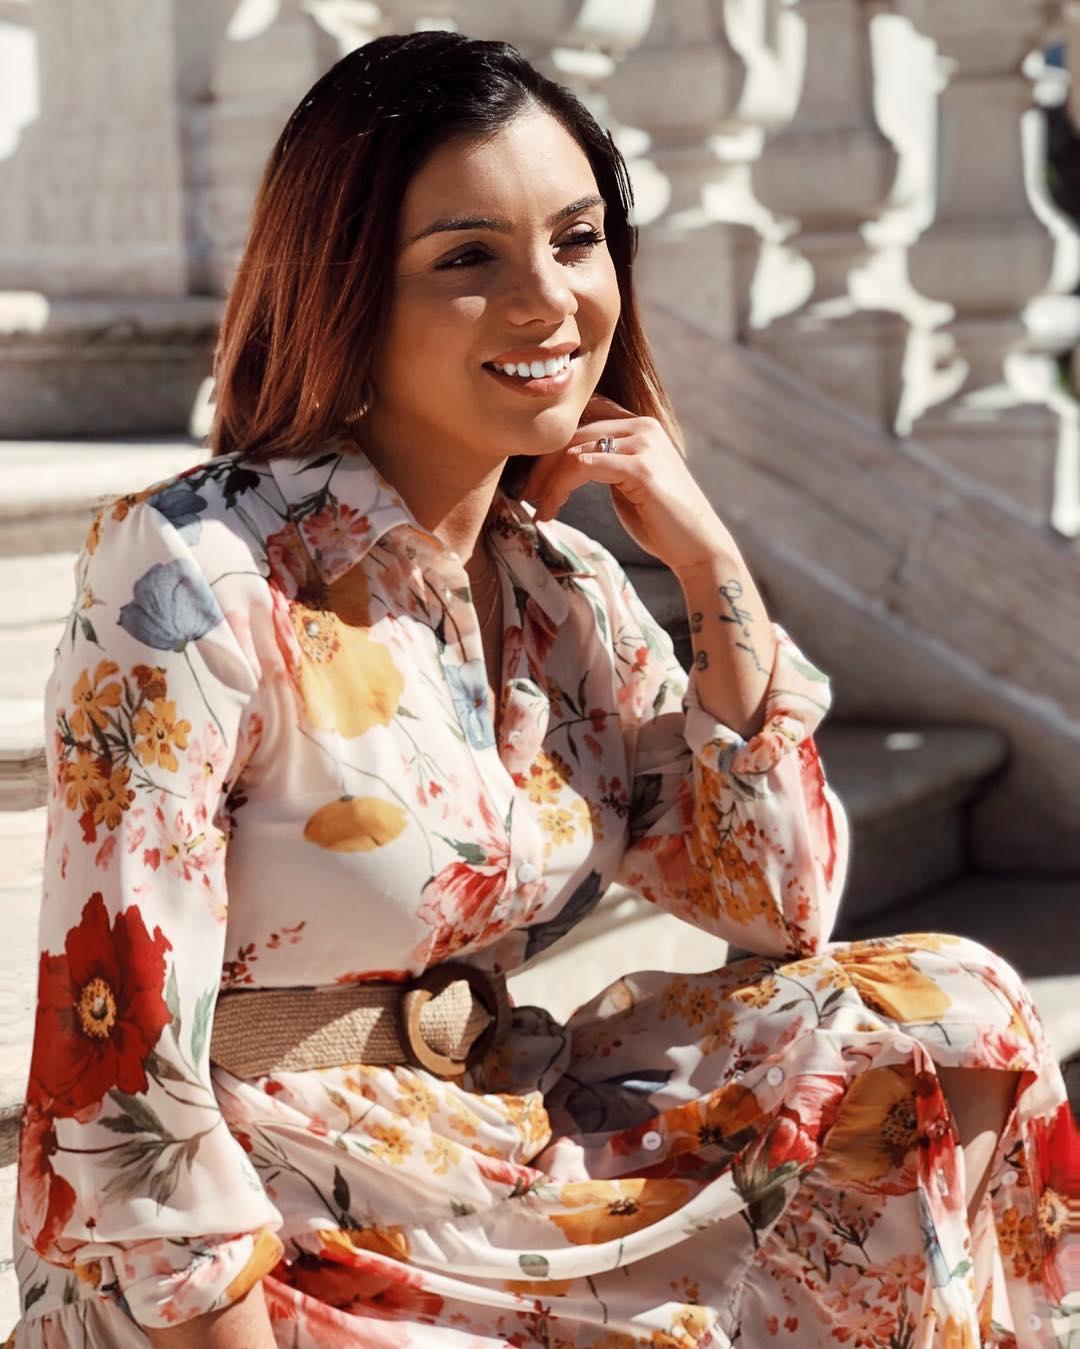 dress with floral print de Zara sur susanabatalha03